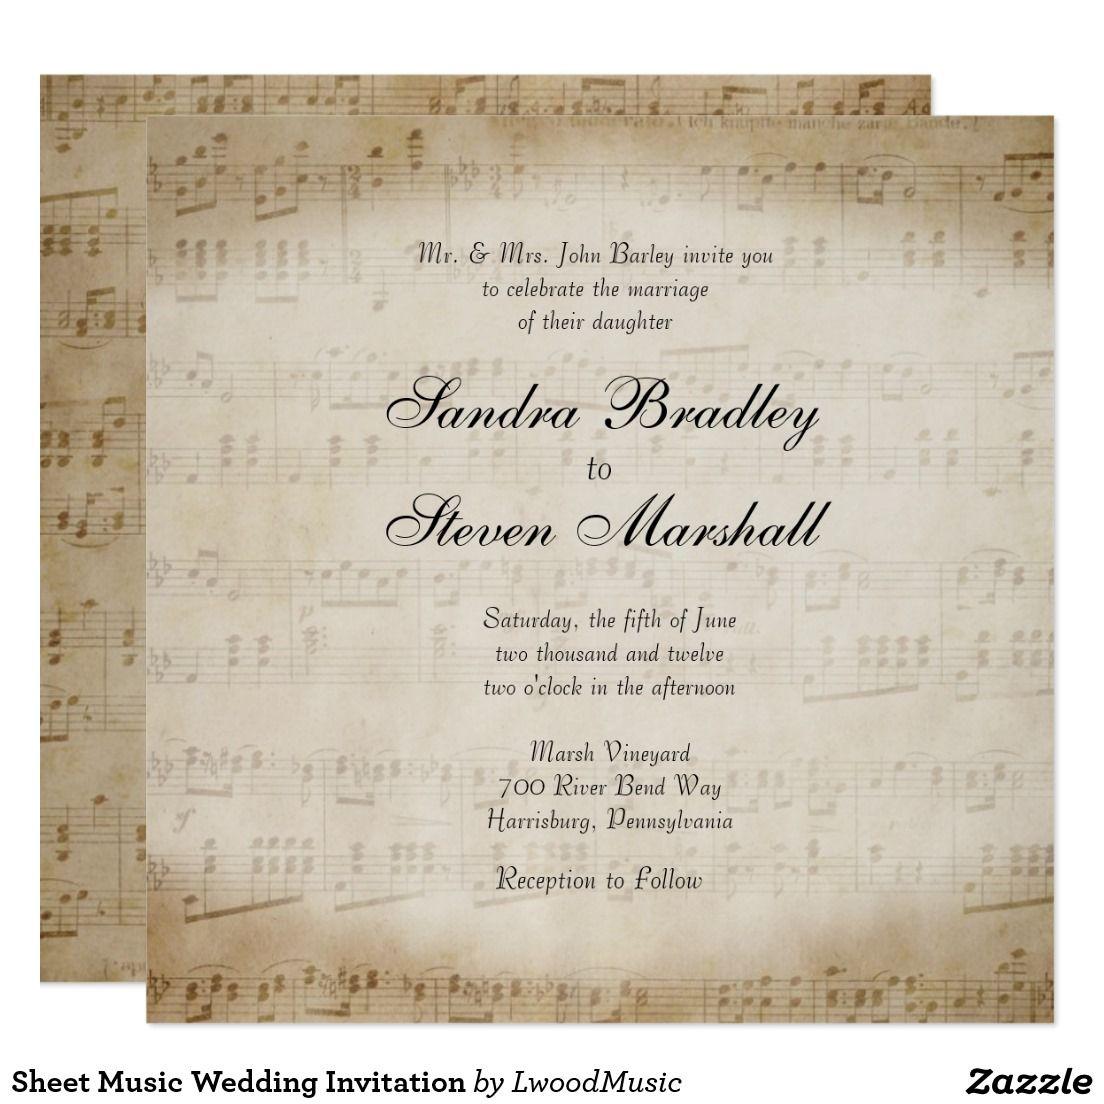 Sheet Music Wedding Invitation | Music Themed Wedding | Pinterest ...